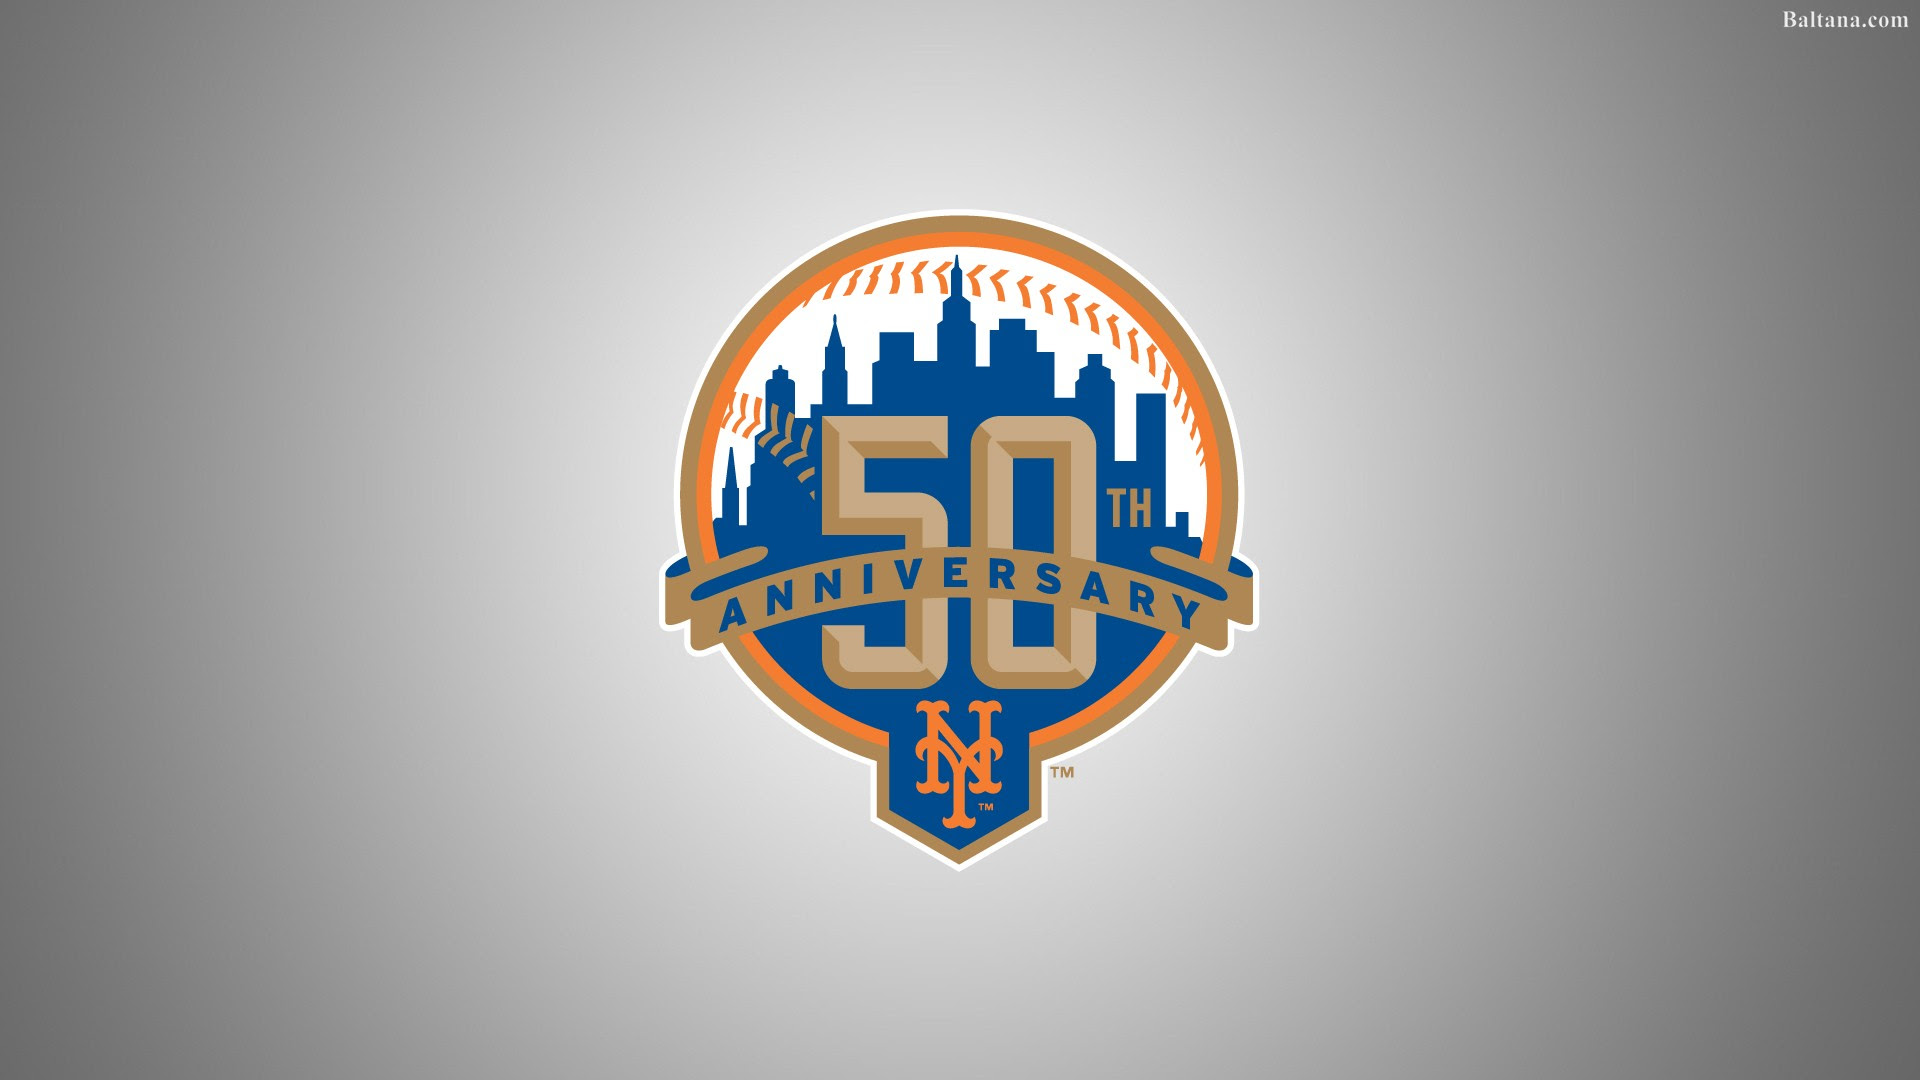 New York Mets Hd Wallpapers 33217 Baltana